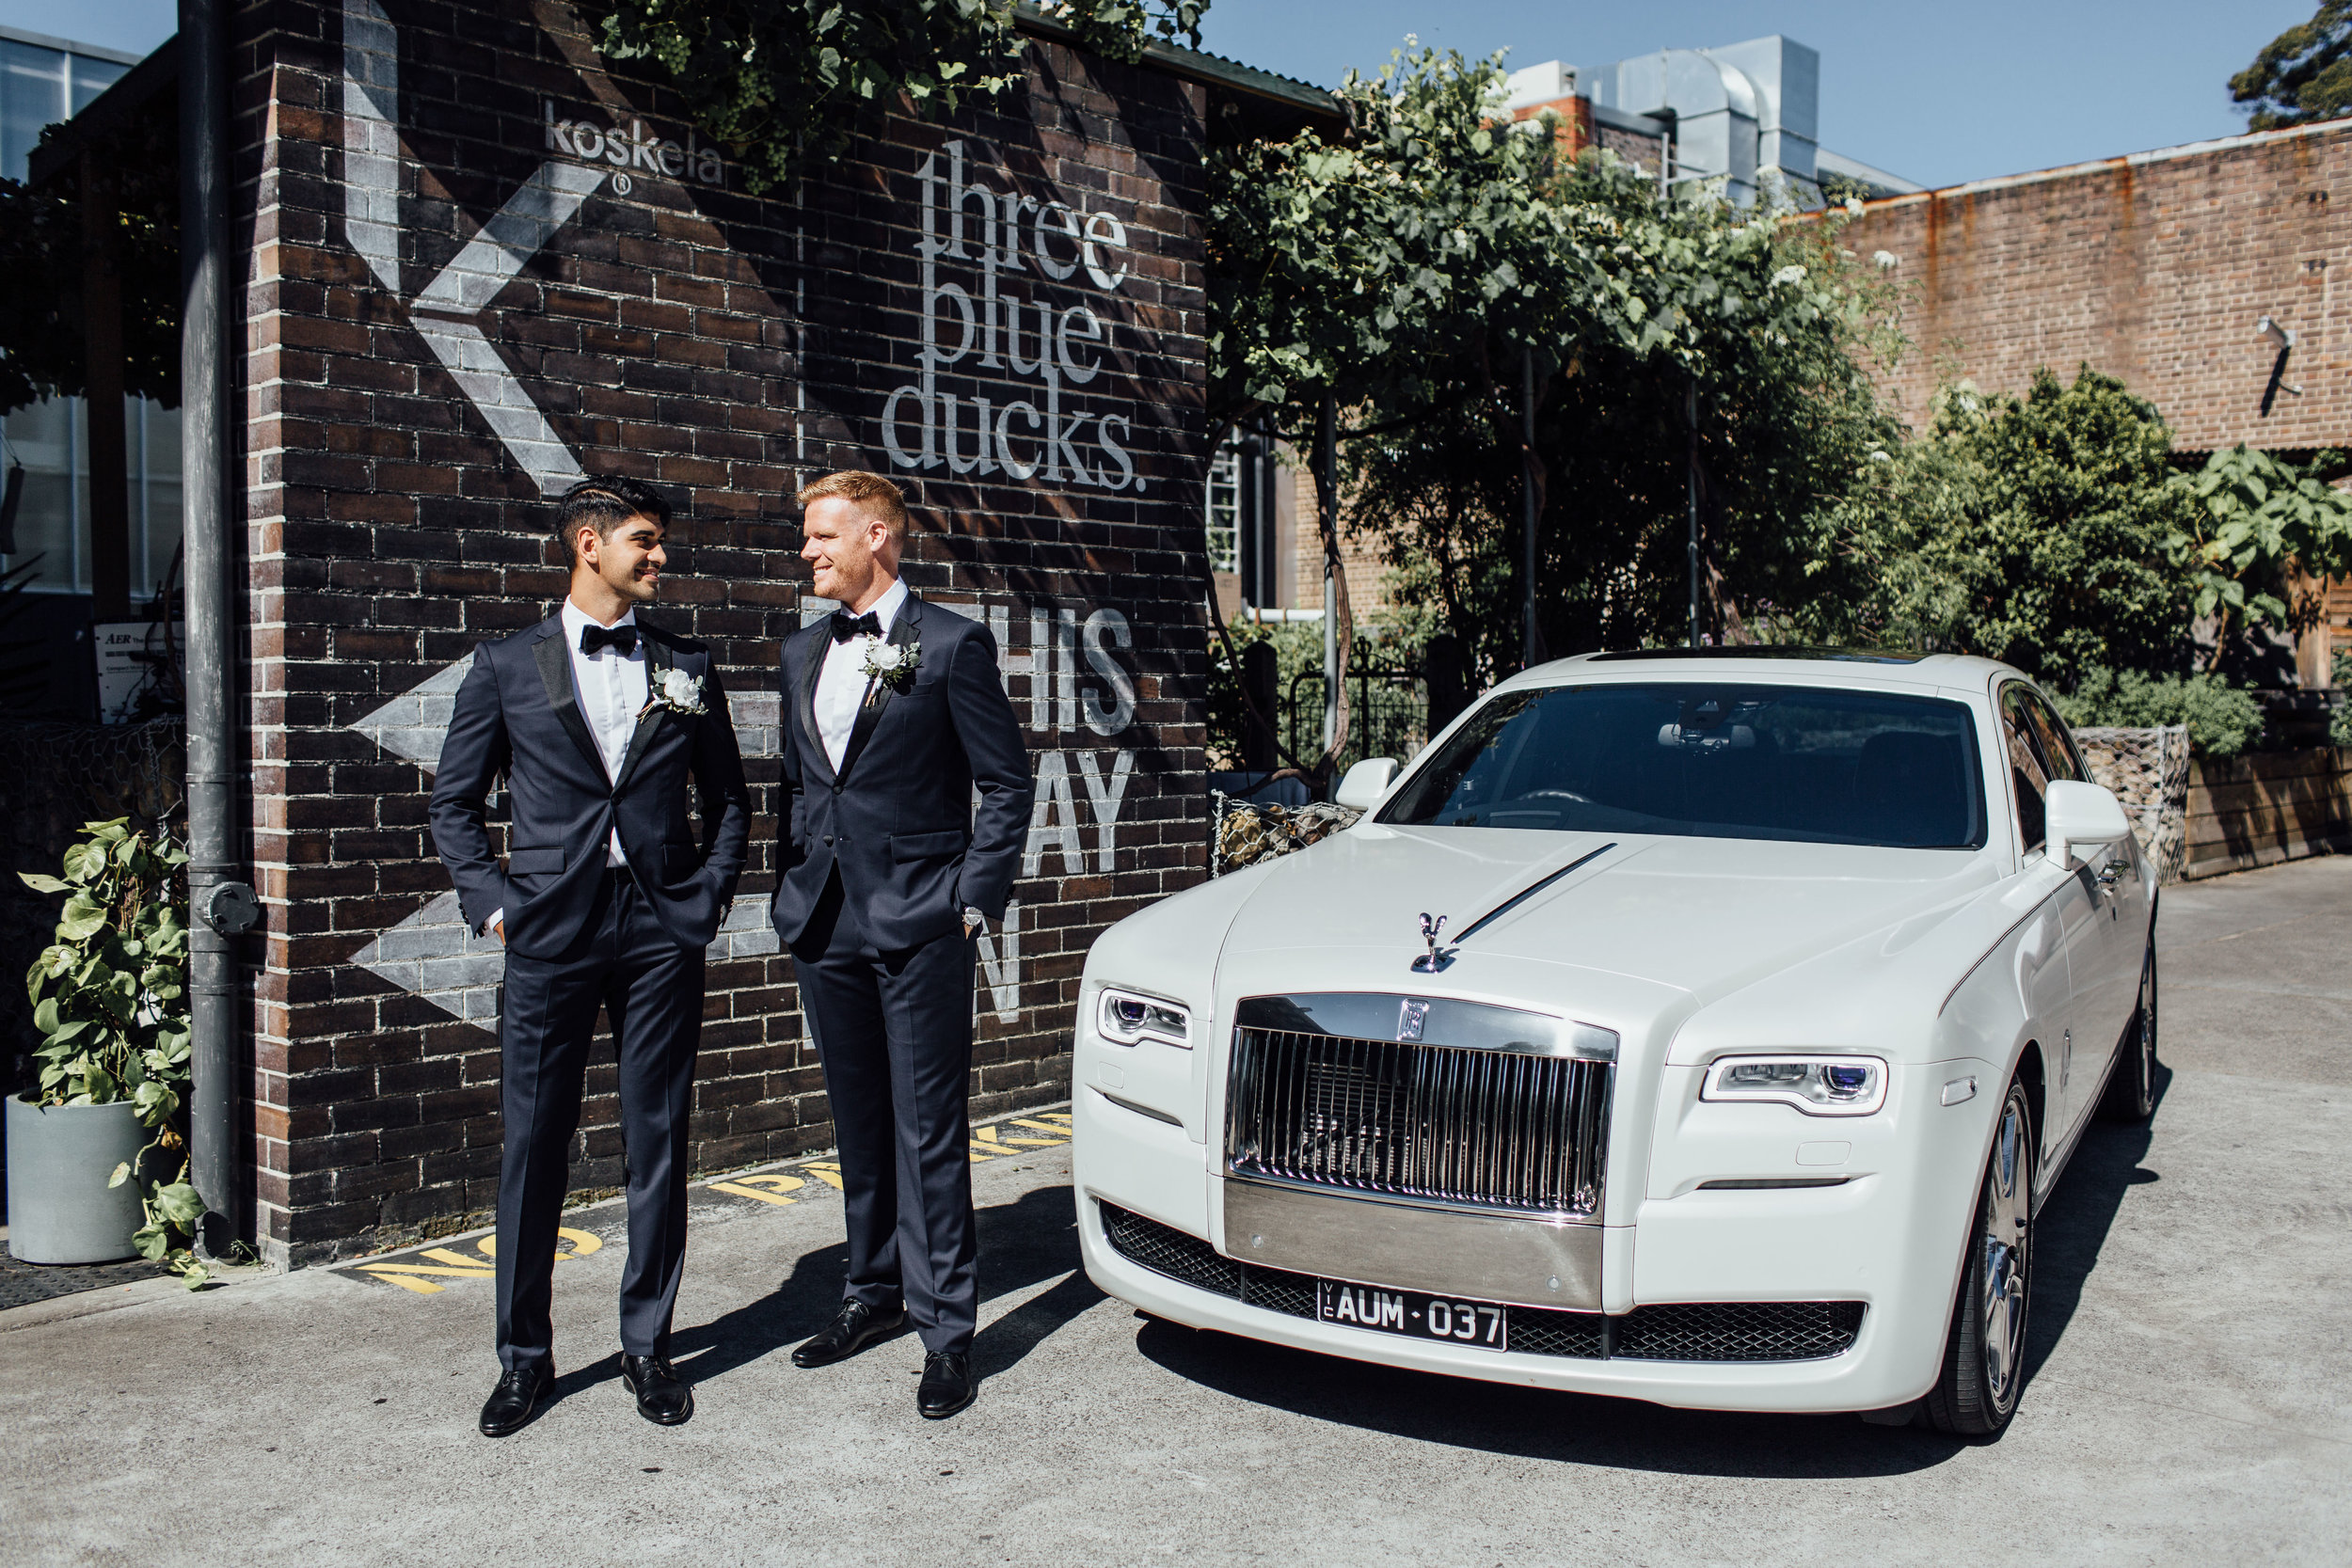 Stephen&David-Wedding-250.jpg